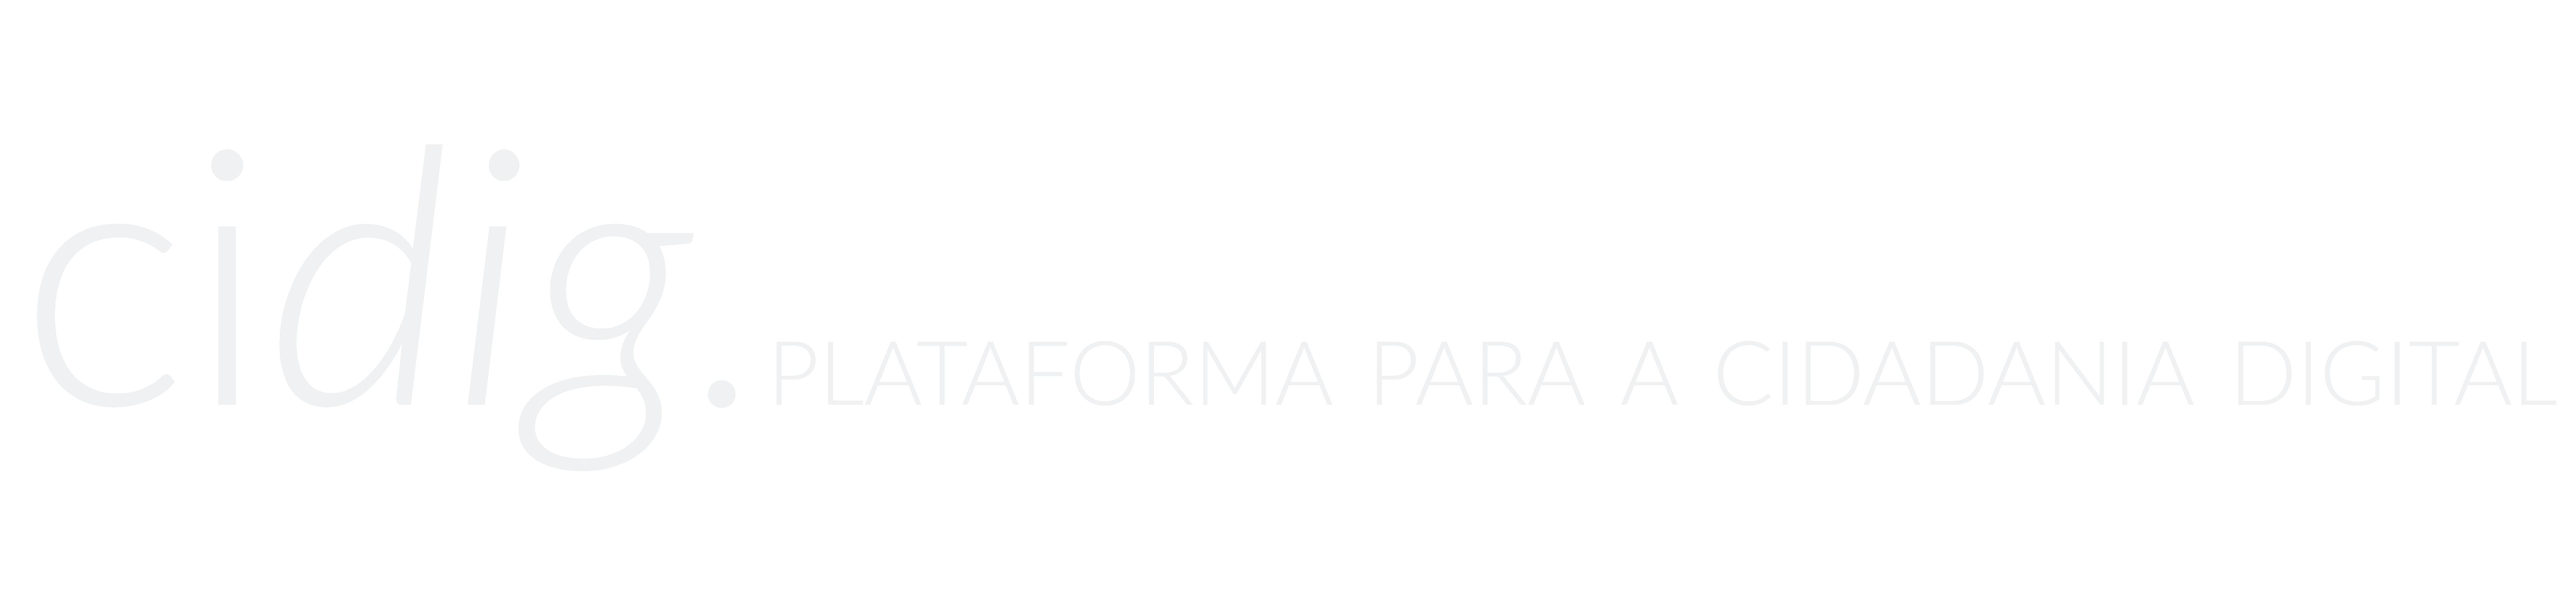 Logo Plataforma Cidadania Digital